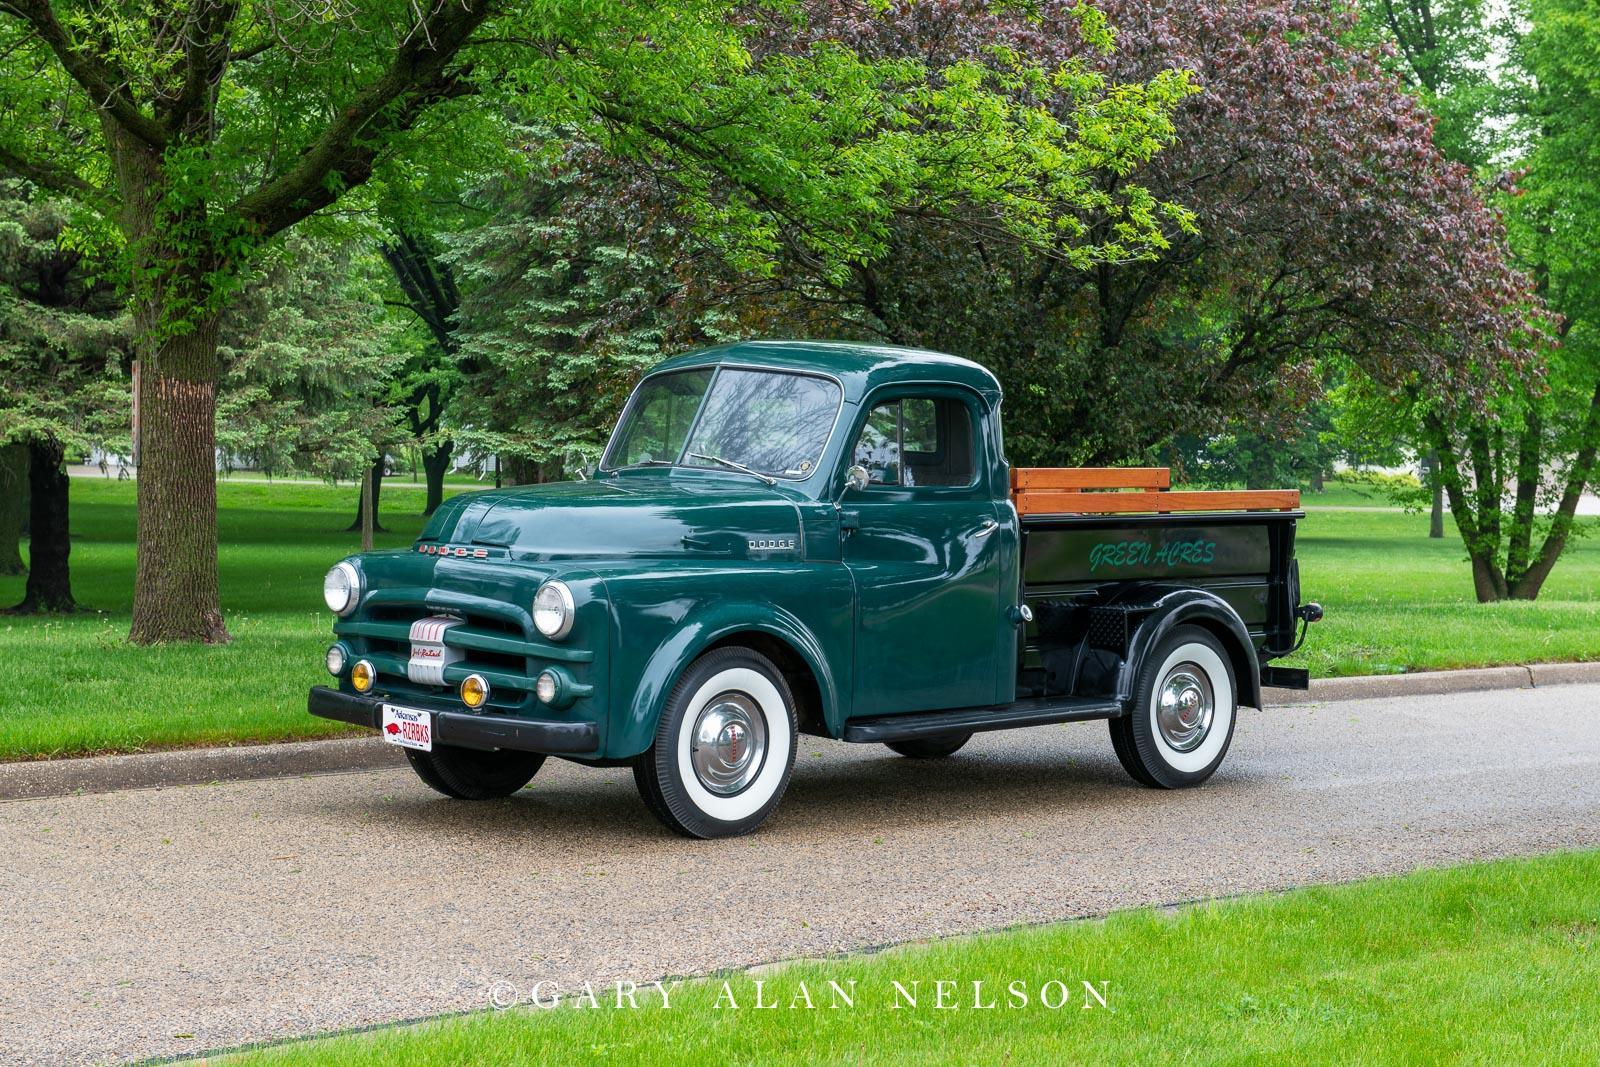 1950 Dodge B-2-B 1/2 ton Pickup